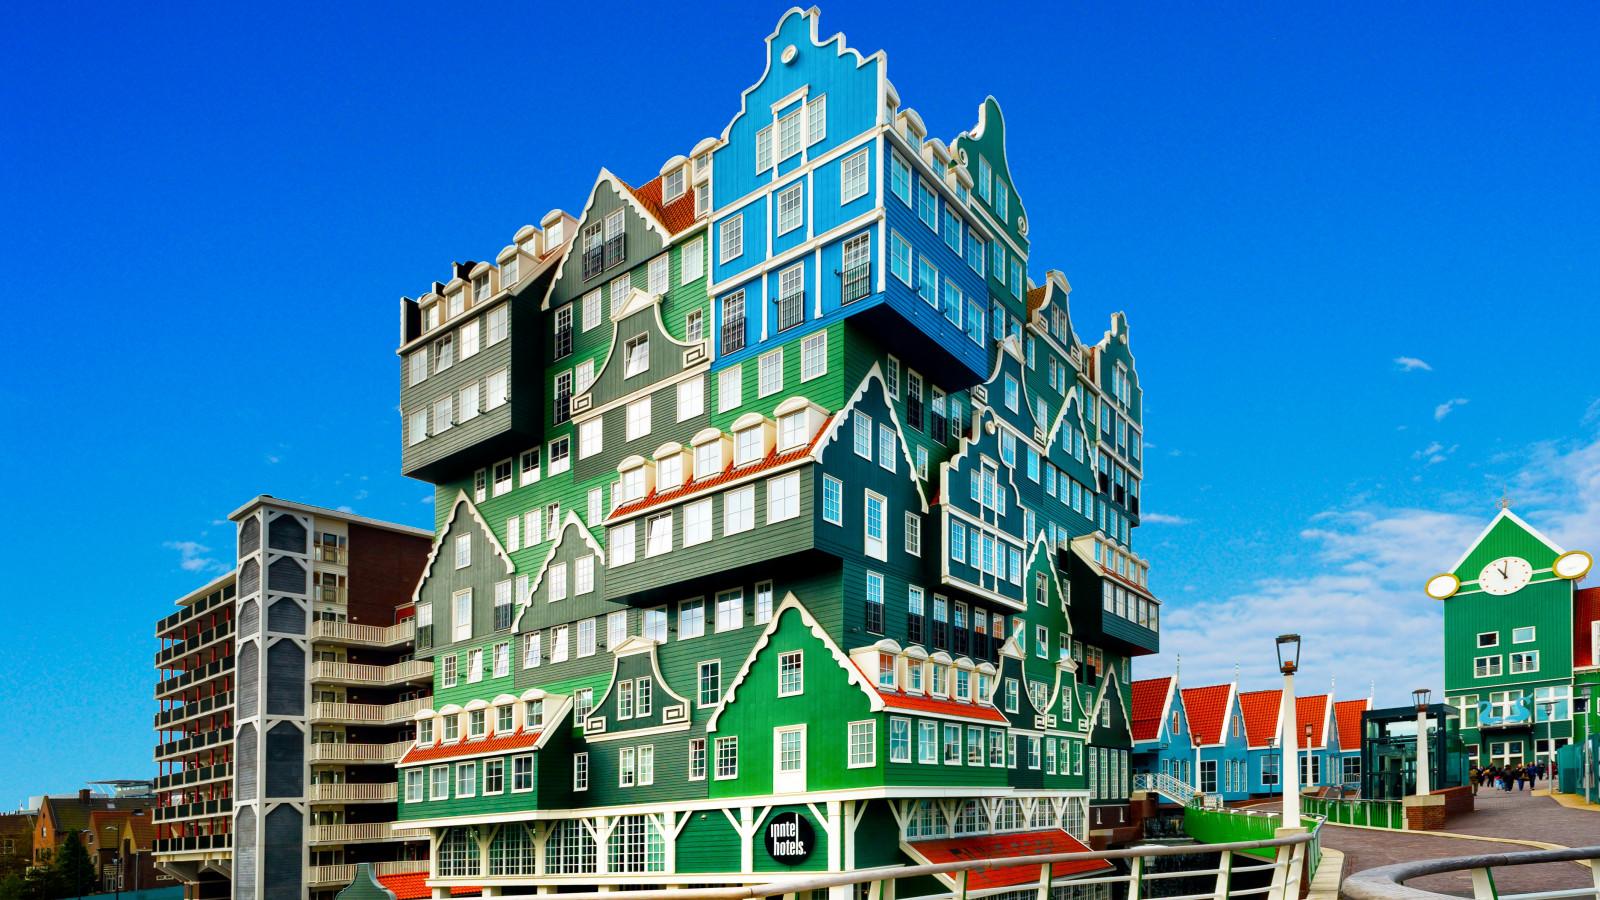 Peter Barnes / Inntel hotels